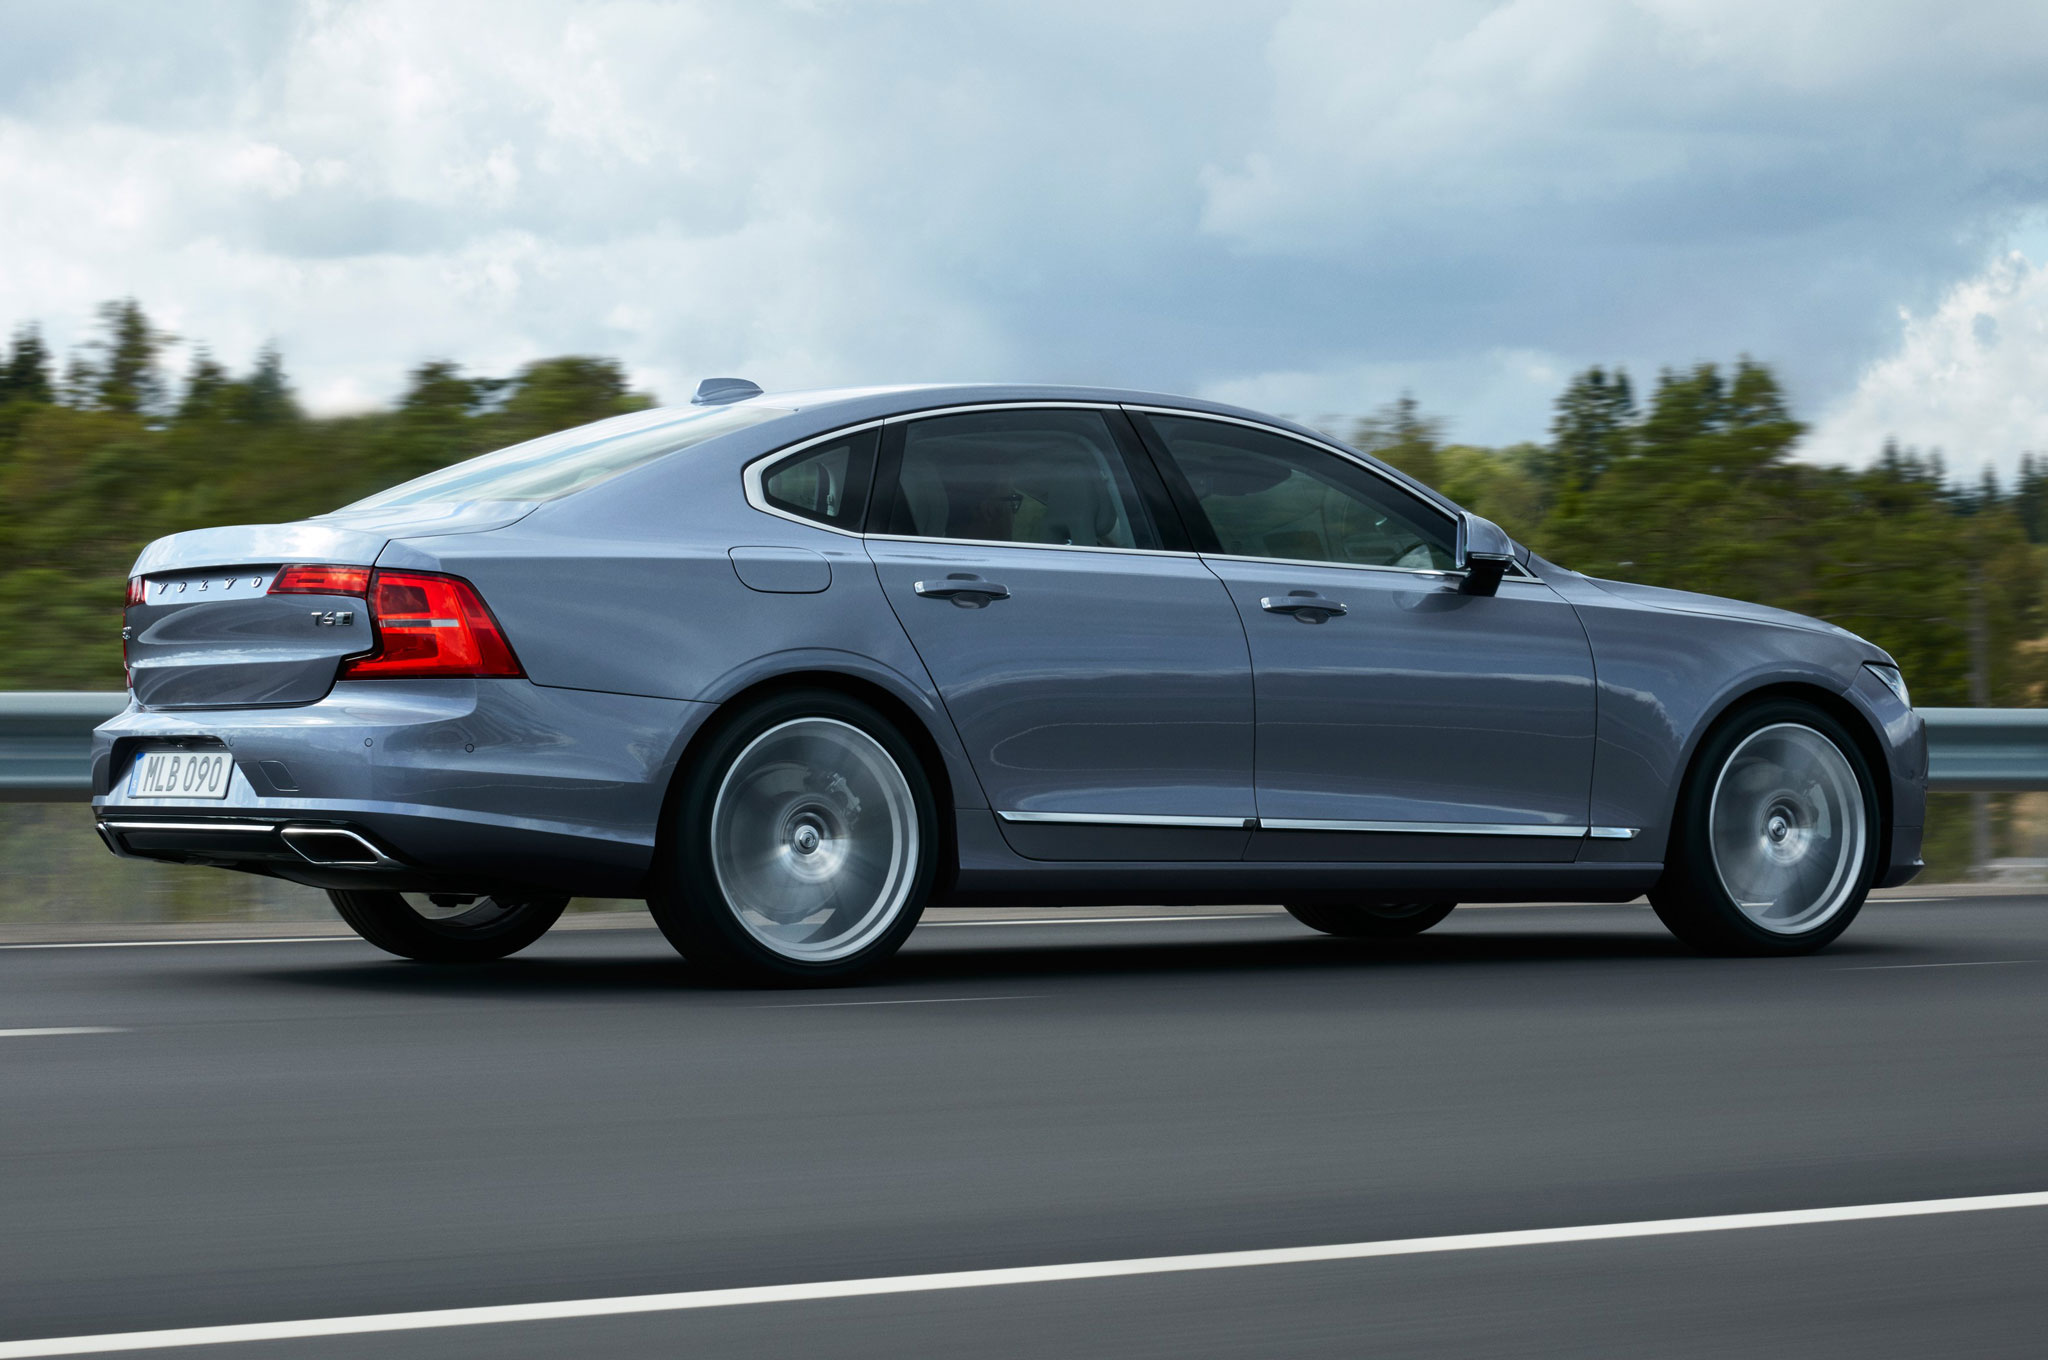 2017 volvo s90 luxury sedan fully revealed with xc90-inspired design